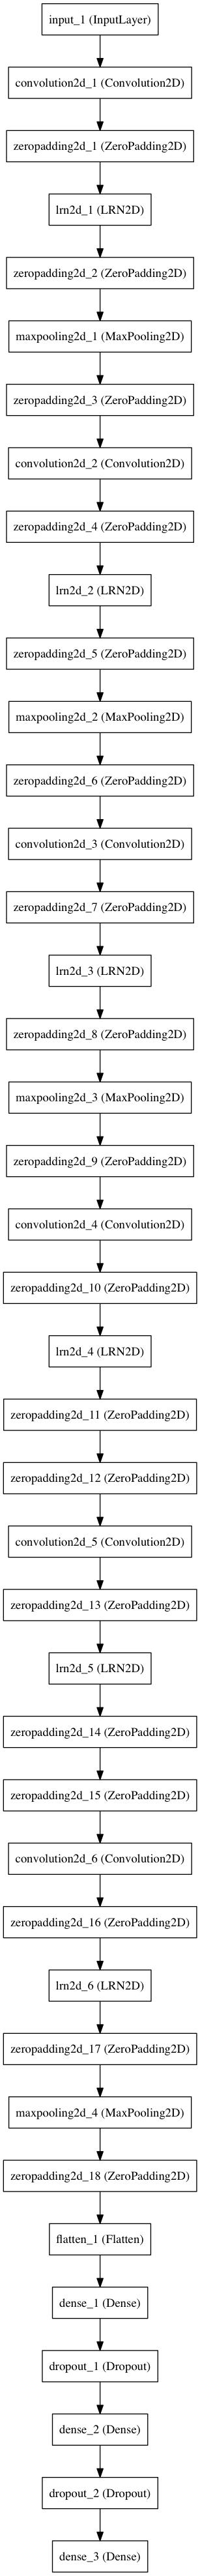 AlexNet - ImageNet Models (Keras)